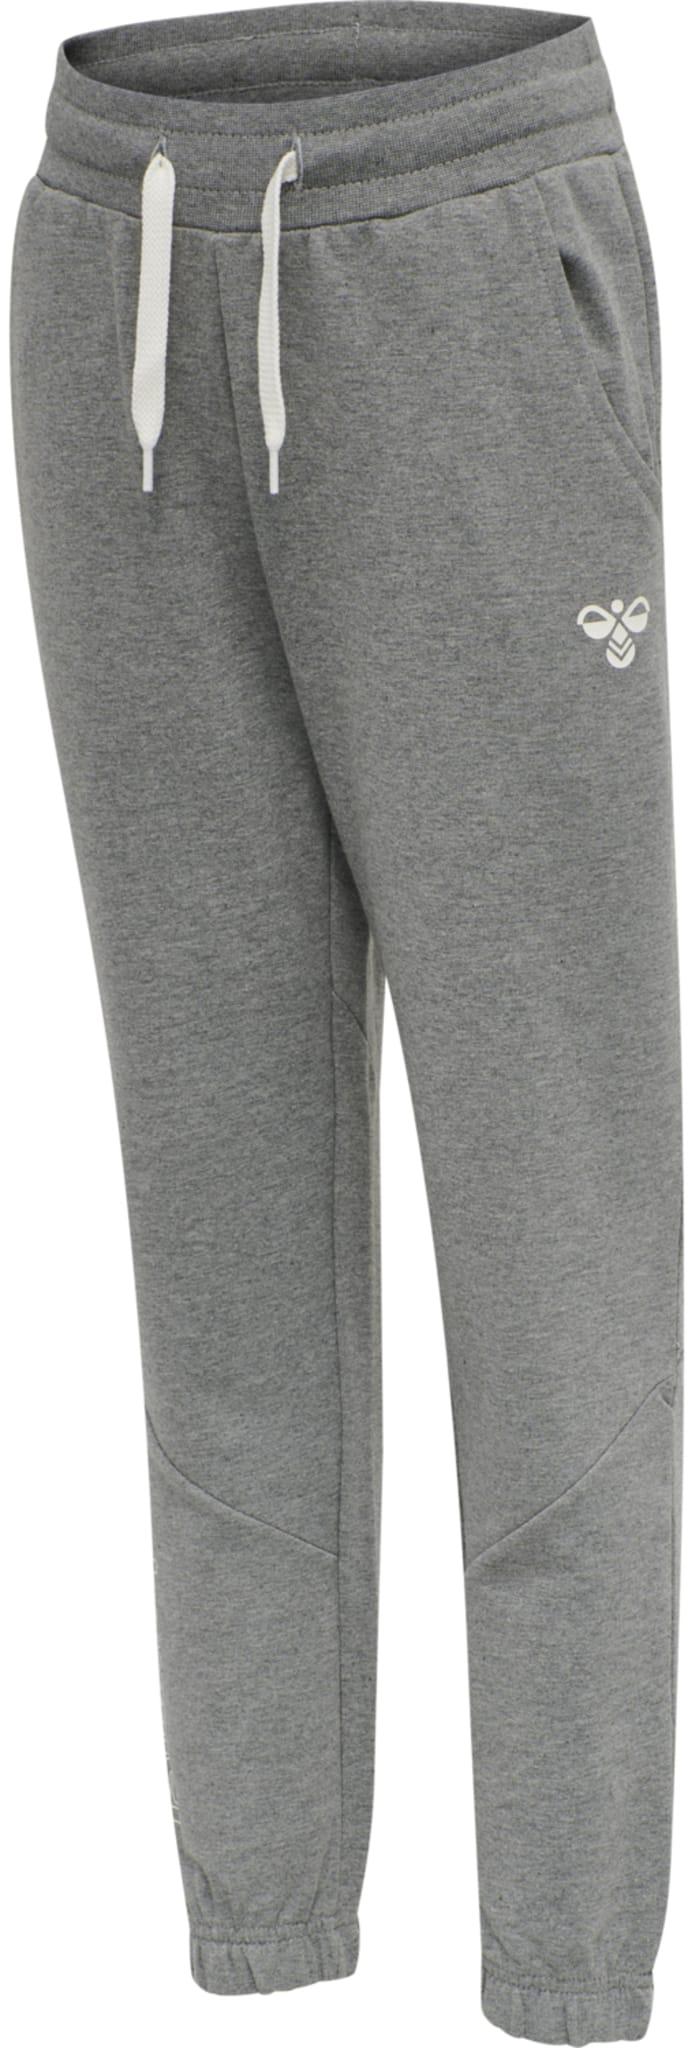 HmlNueve Pants